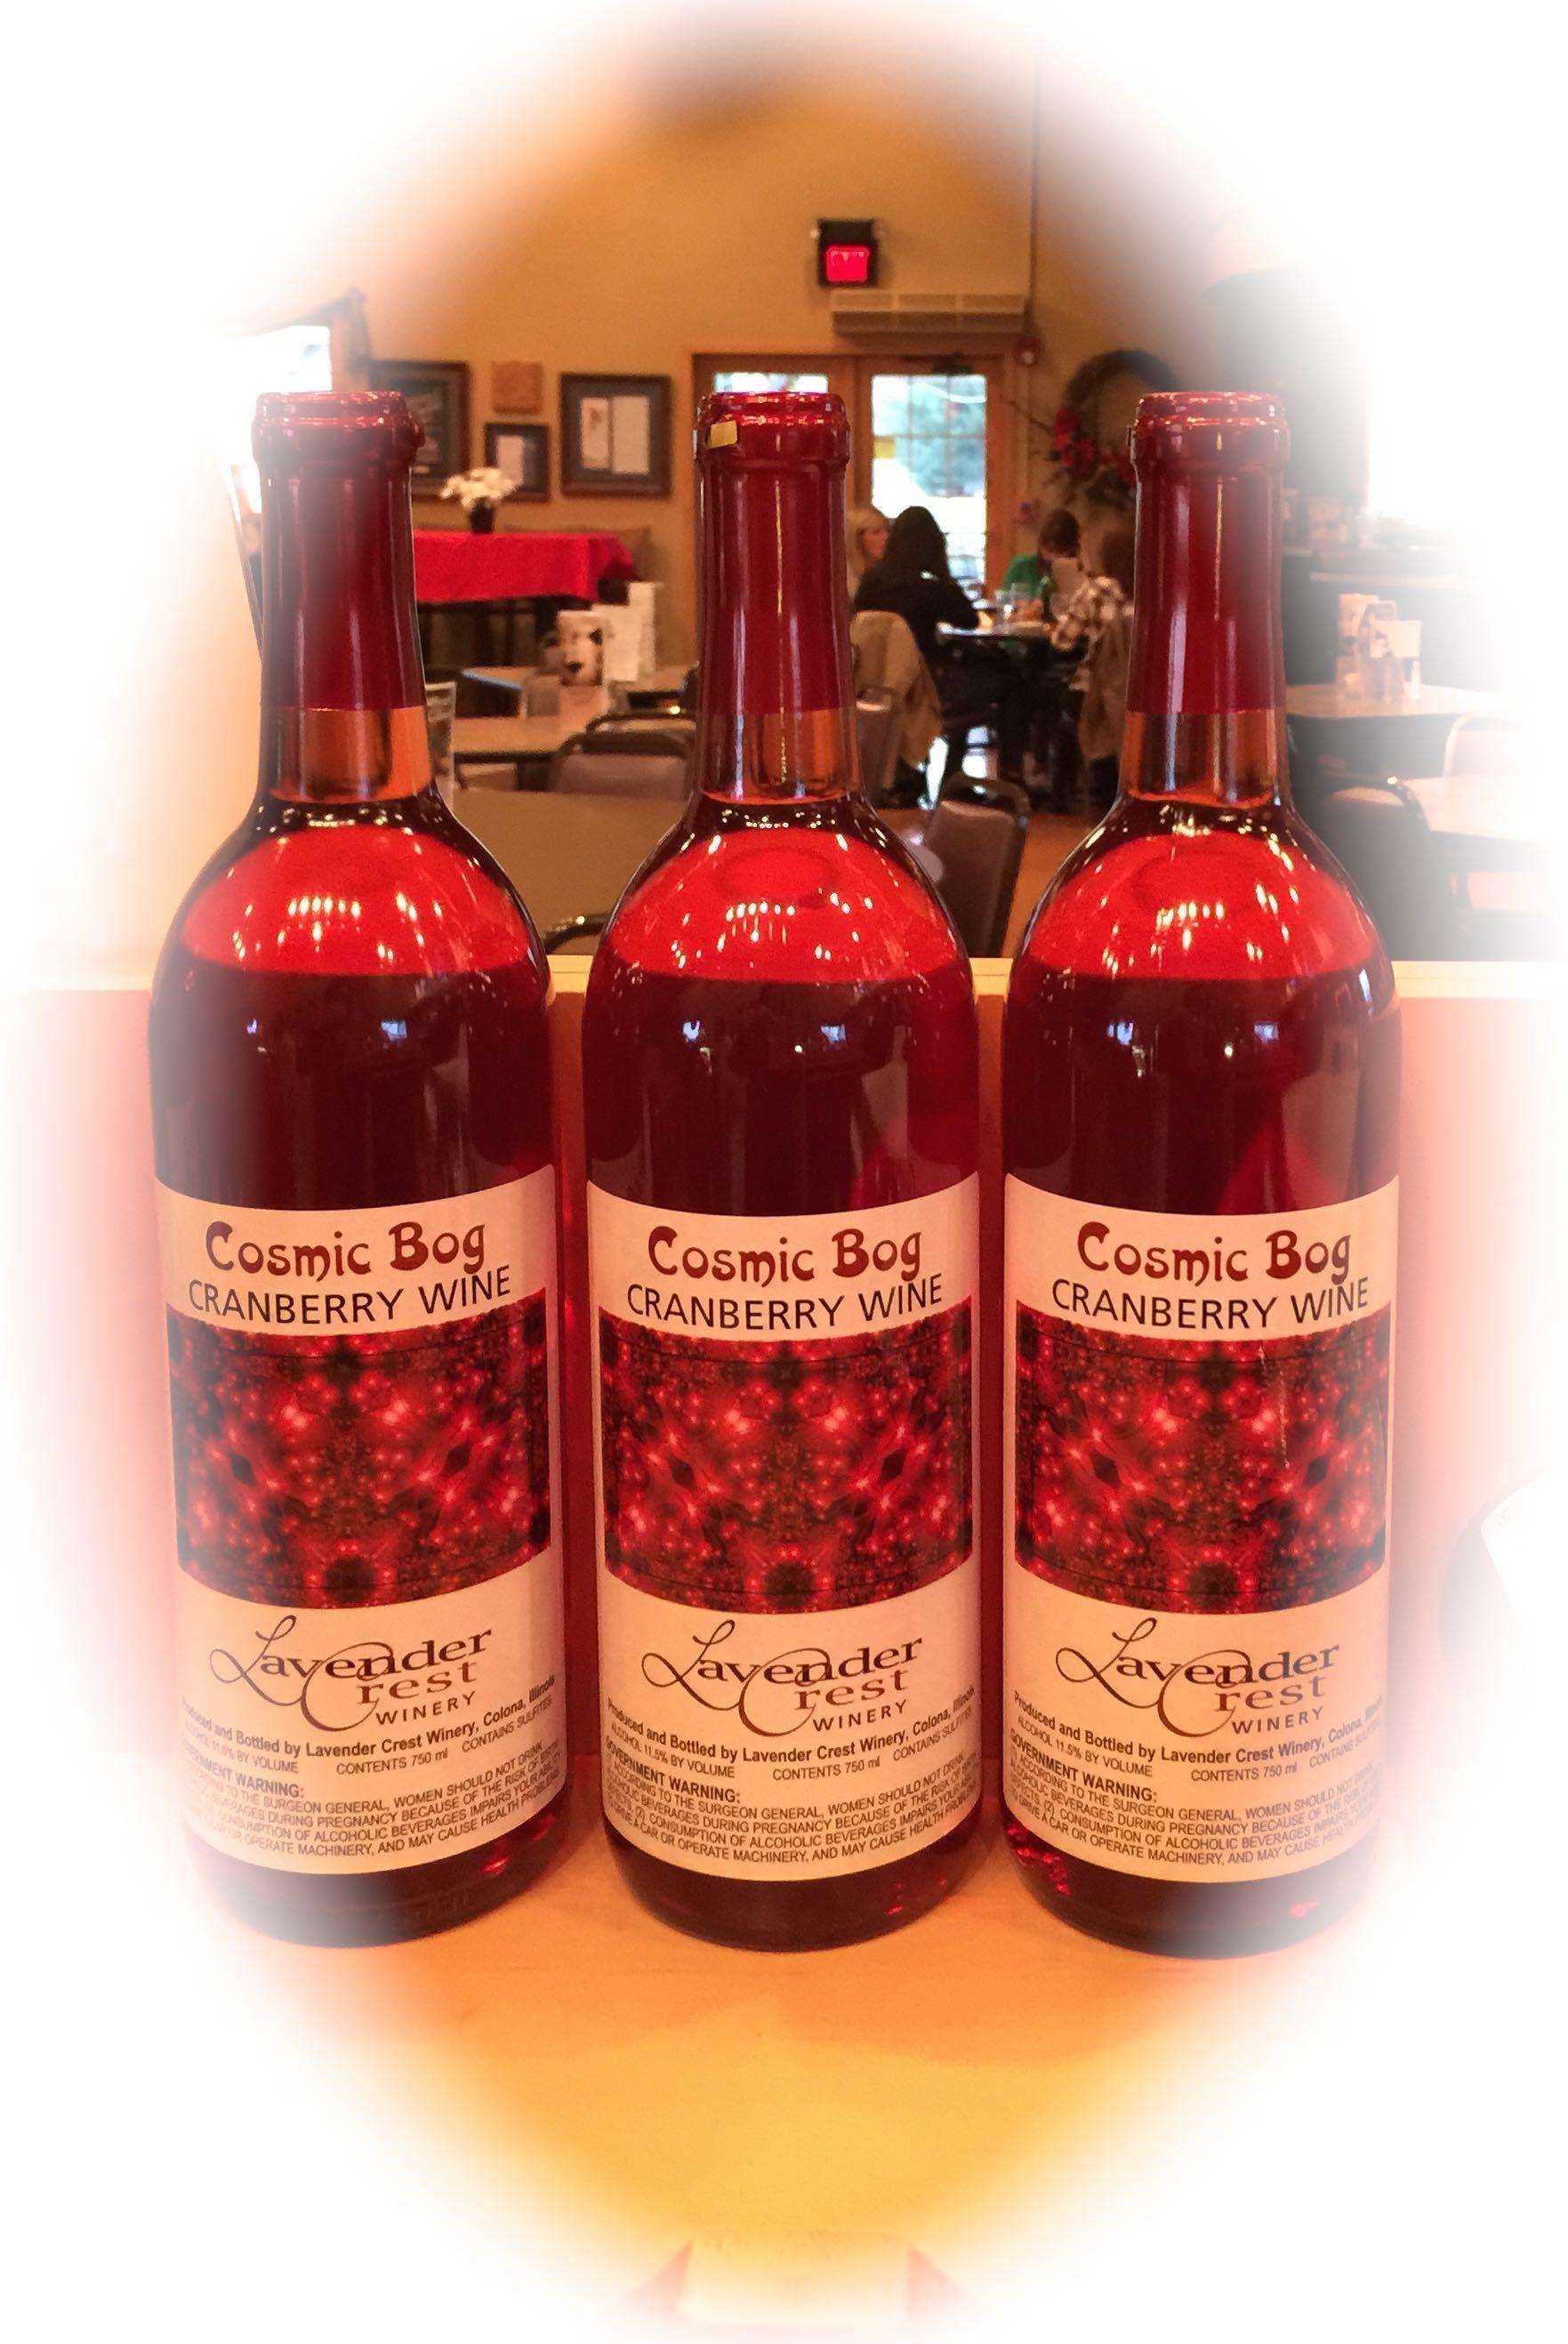 Cosmic Bog Sweet Cranberry Wine Cranberry Wine Award Winning Wine Cranberry